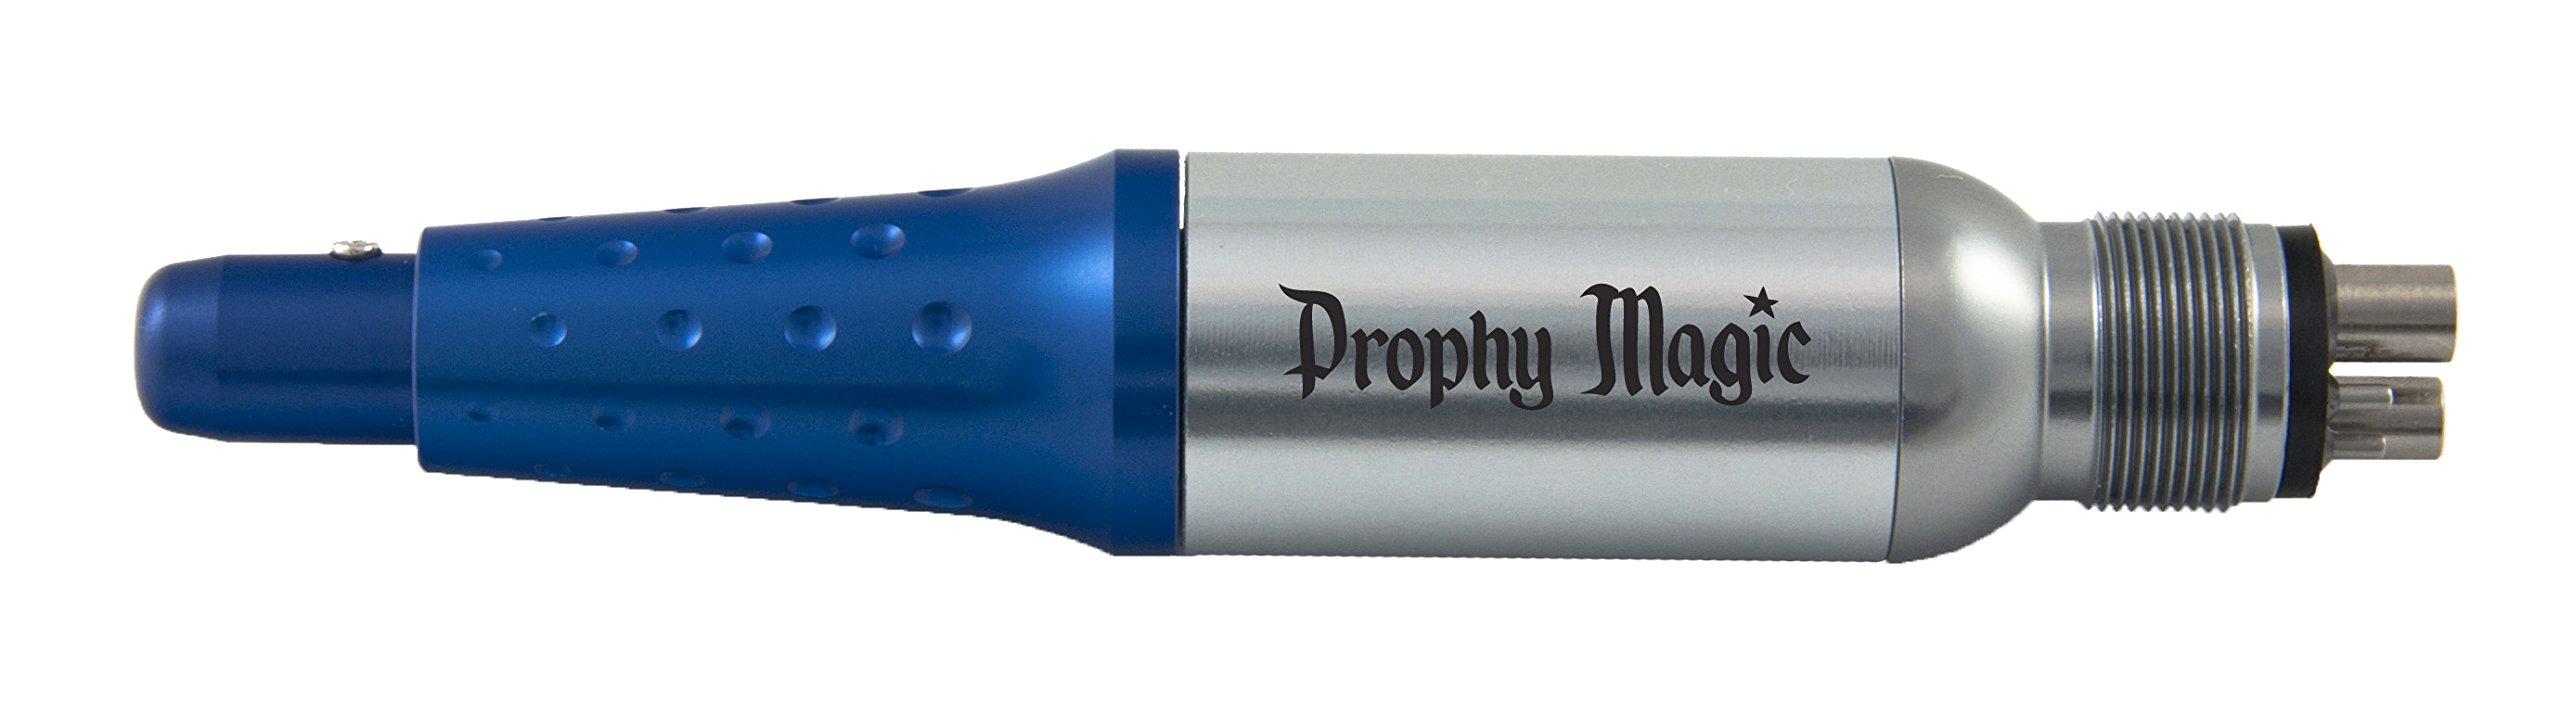 Prophy Magic PM2HH Prophy Magic Low Speed Hygiene Handpiece